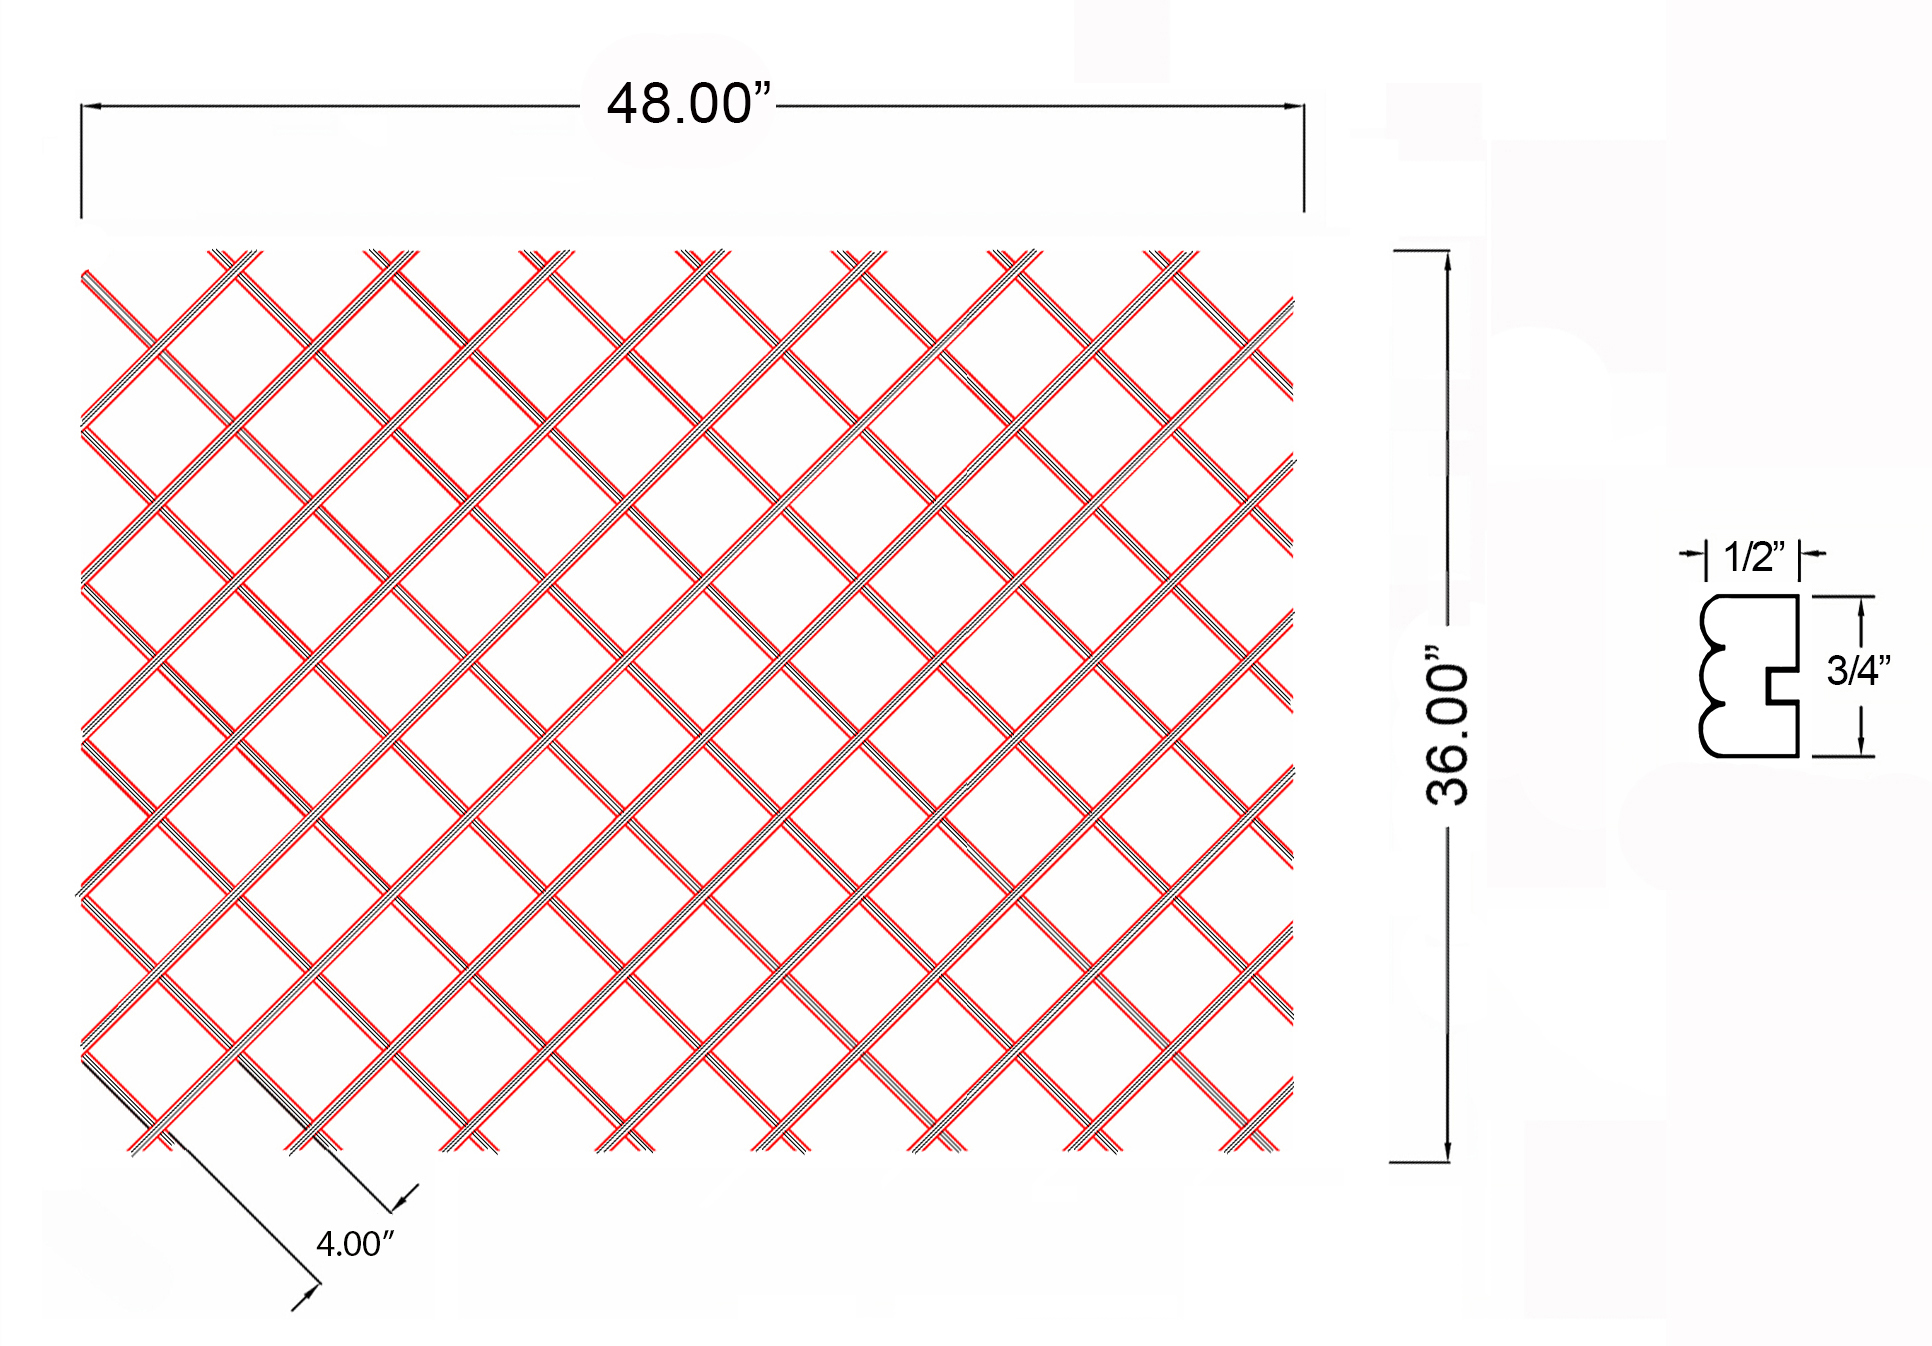 W-WR-BD36X48 Line Drawing